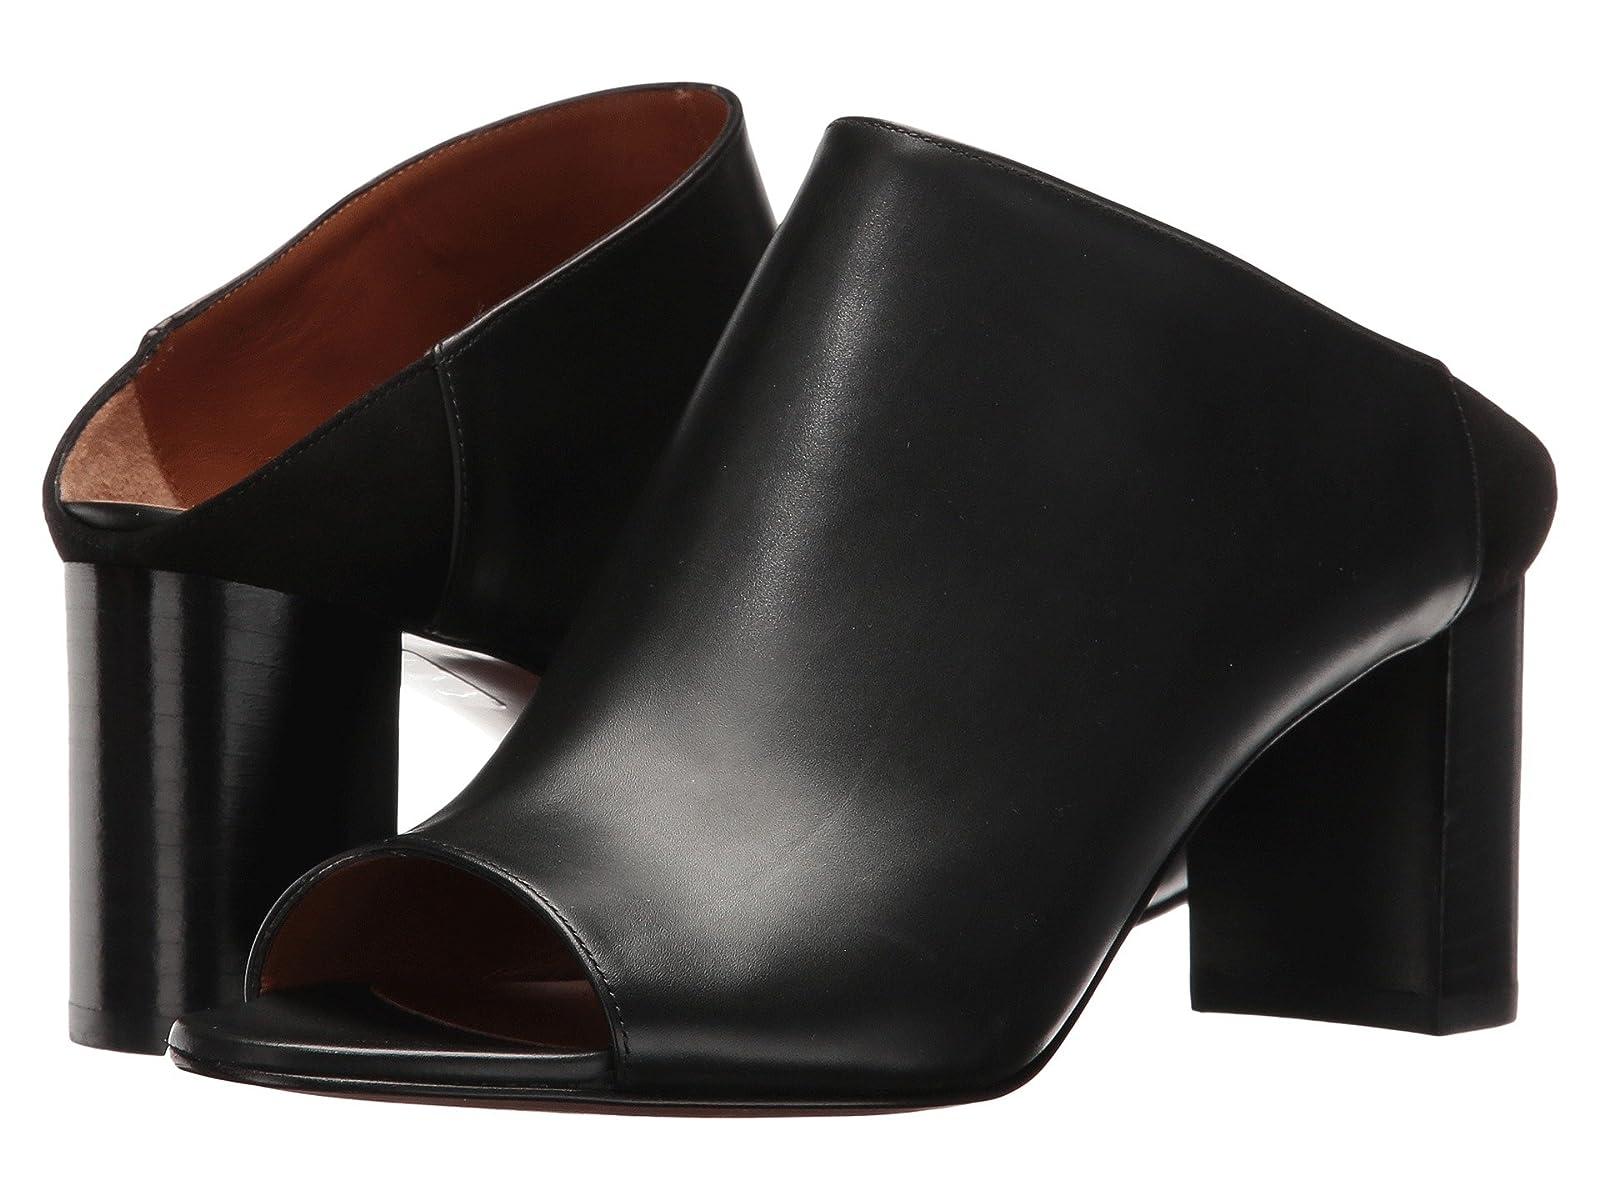 Aquatalia SenecaCheap and distinctive eye-catching shoes